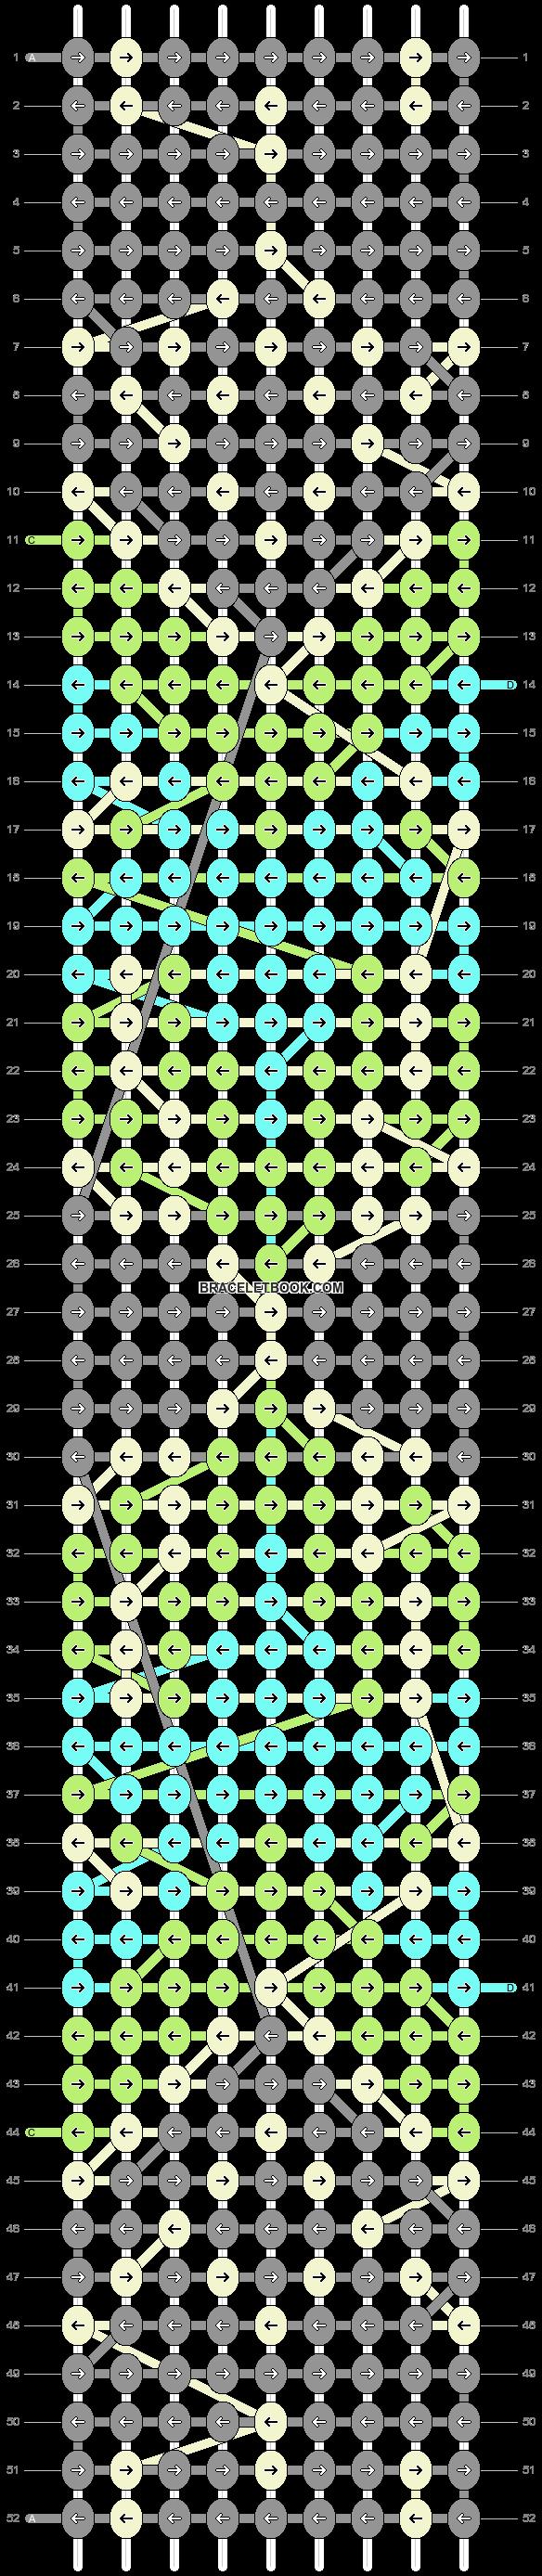 Alpha pattern #10535 pattern